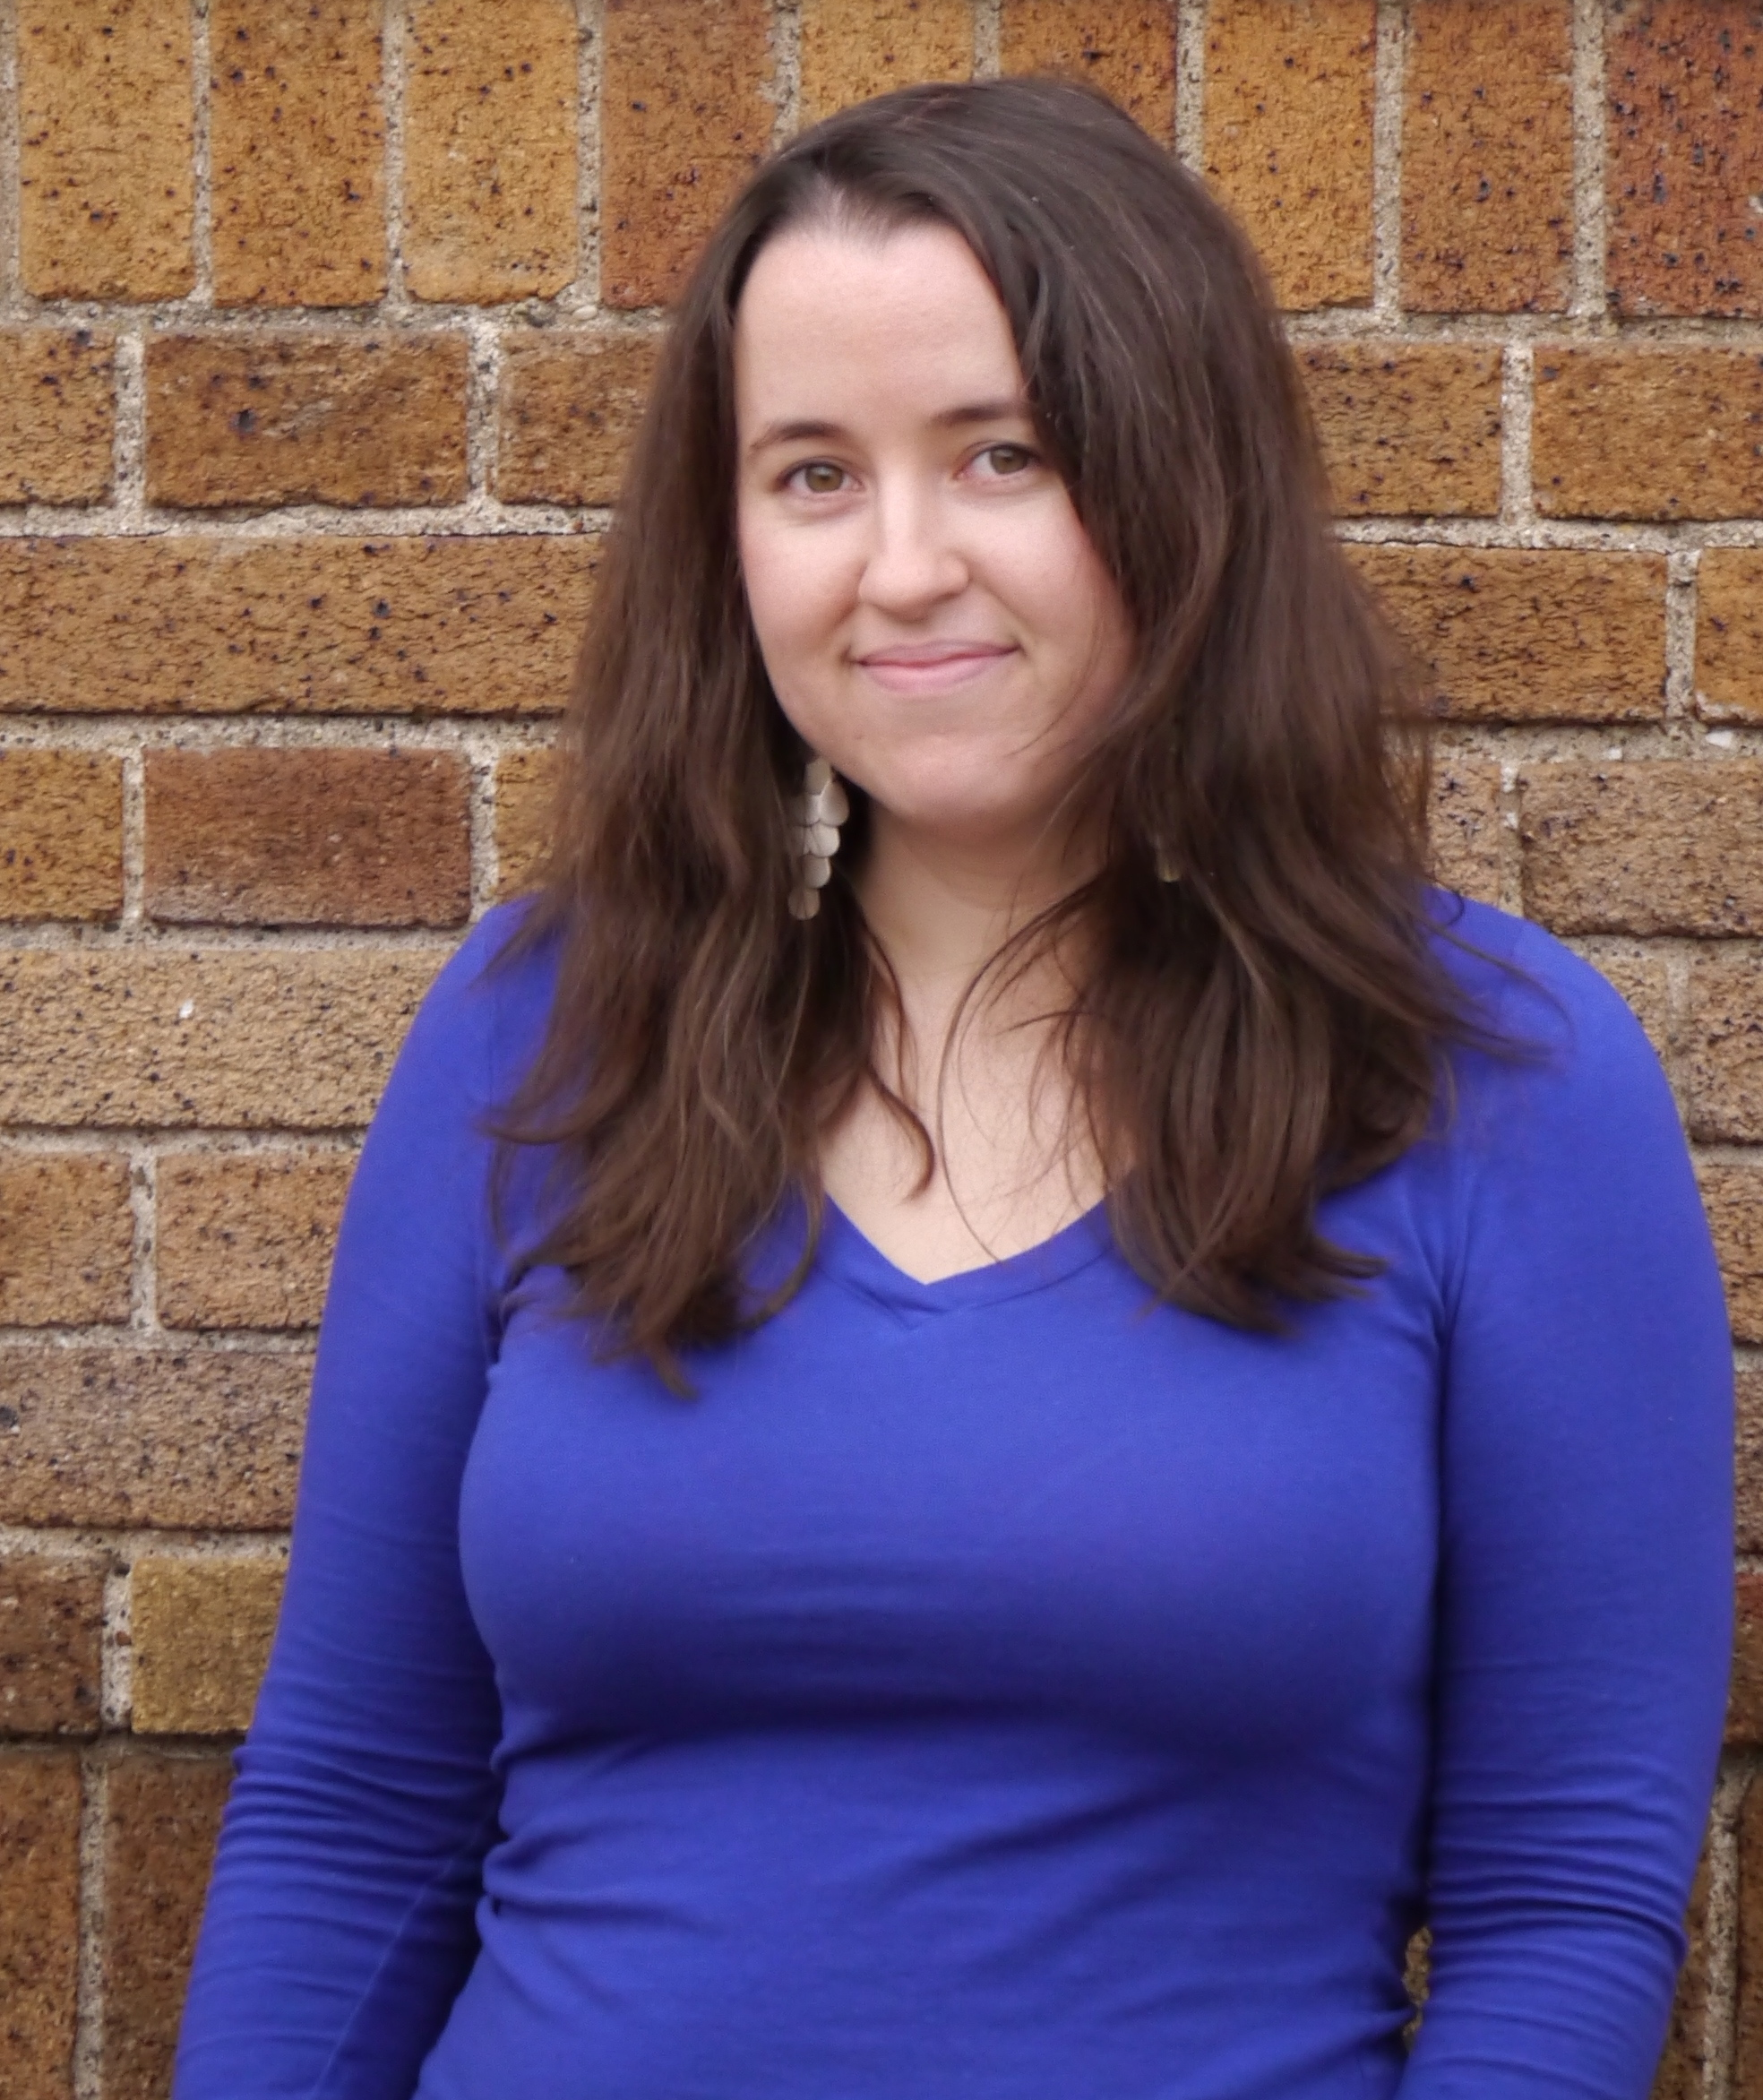 Shauna Gordon-McKeon